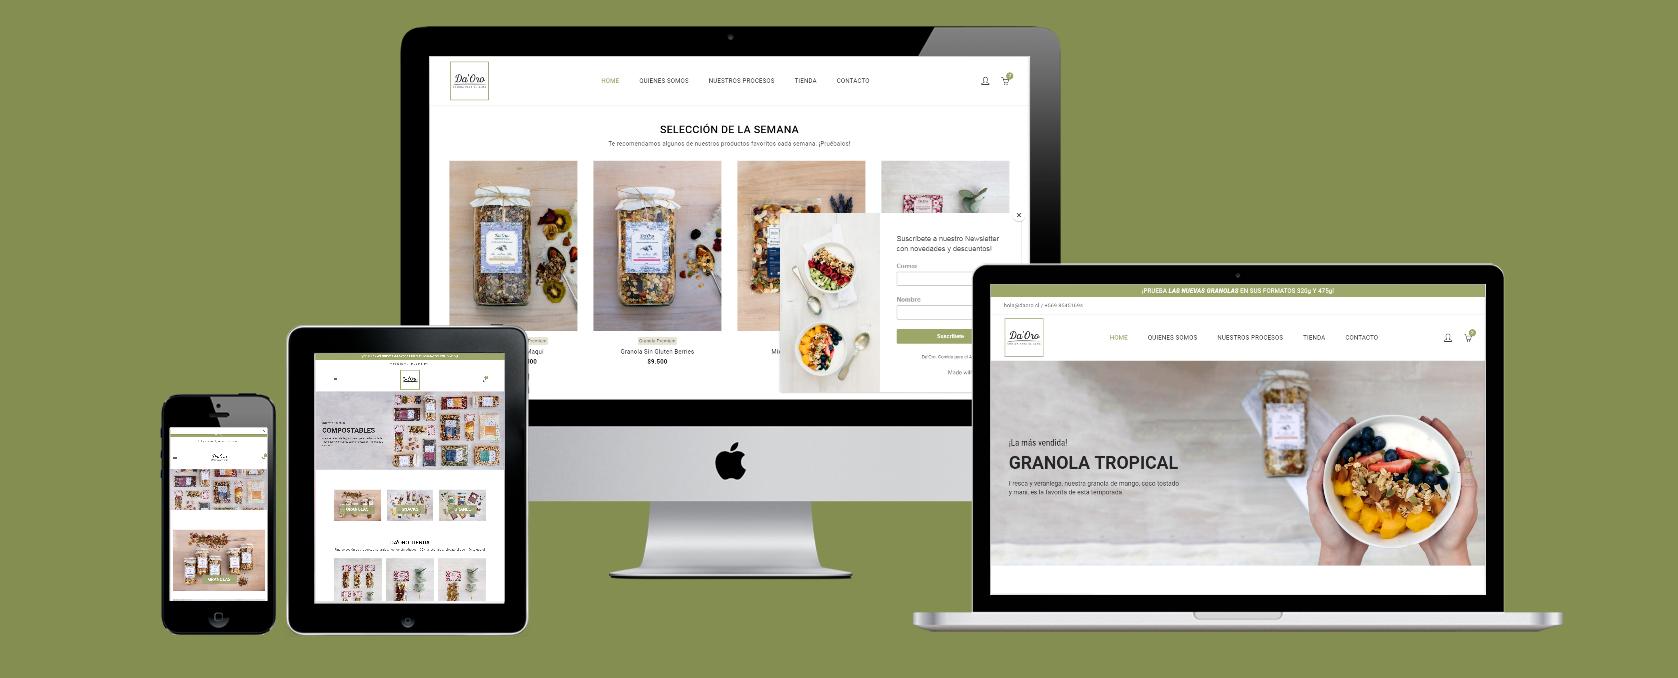 Da'Oro - HolyMonkey - Productora Audiovisual - Diseño Web - Agencia Creativa